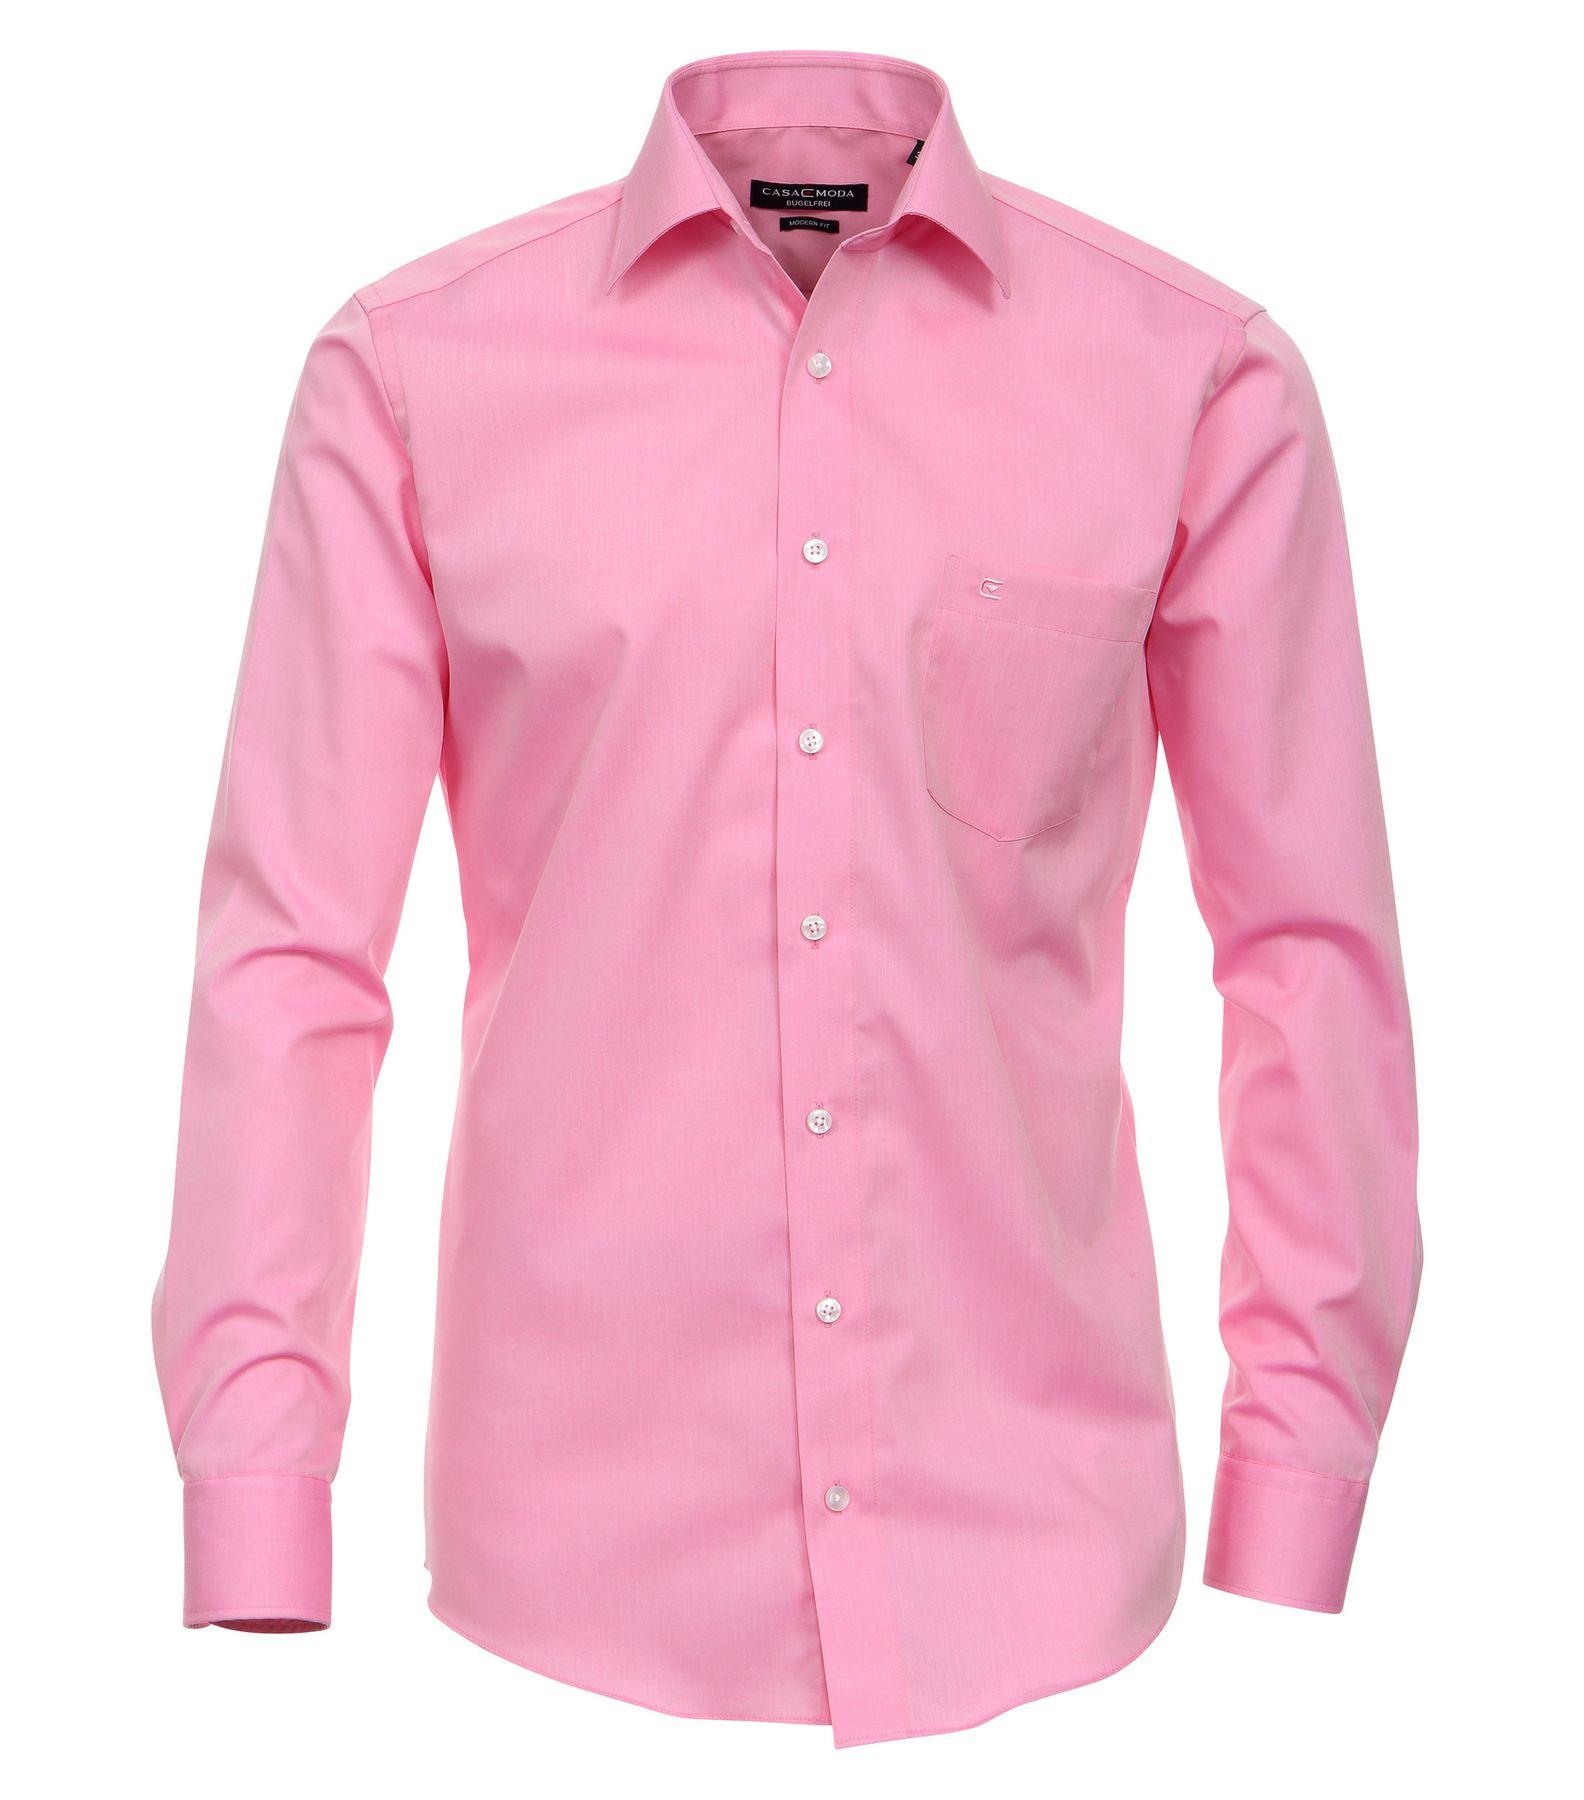 Casamoda - Modern Fit - Bügelfreies Herren Business Langarm Hemd verschiedene Farben (006560A) – Bild 24